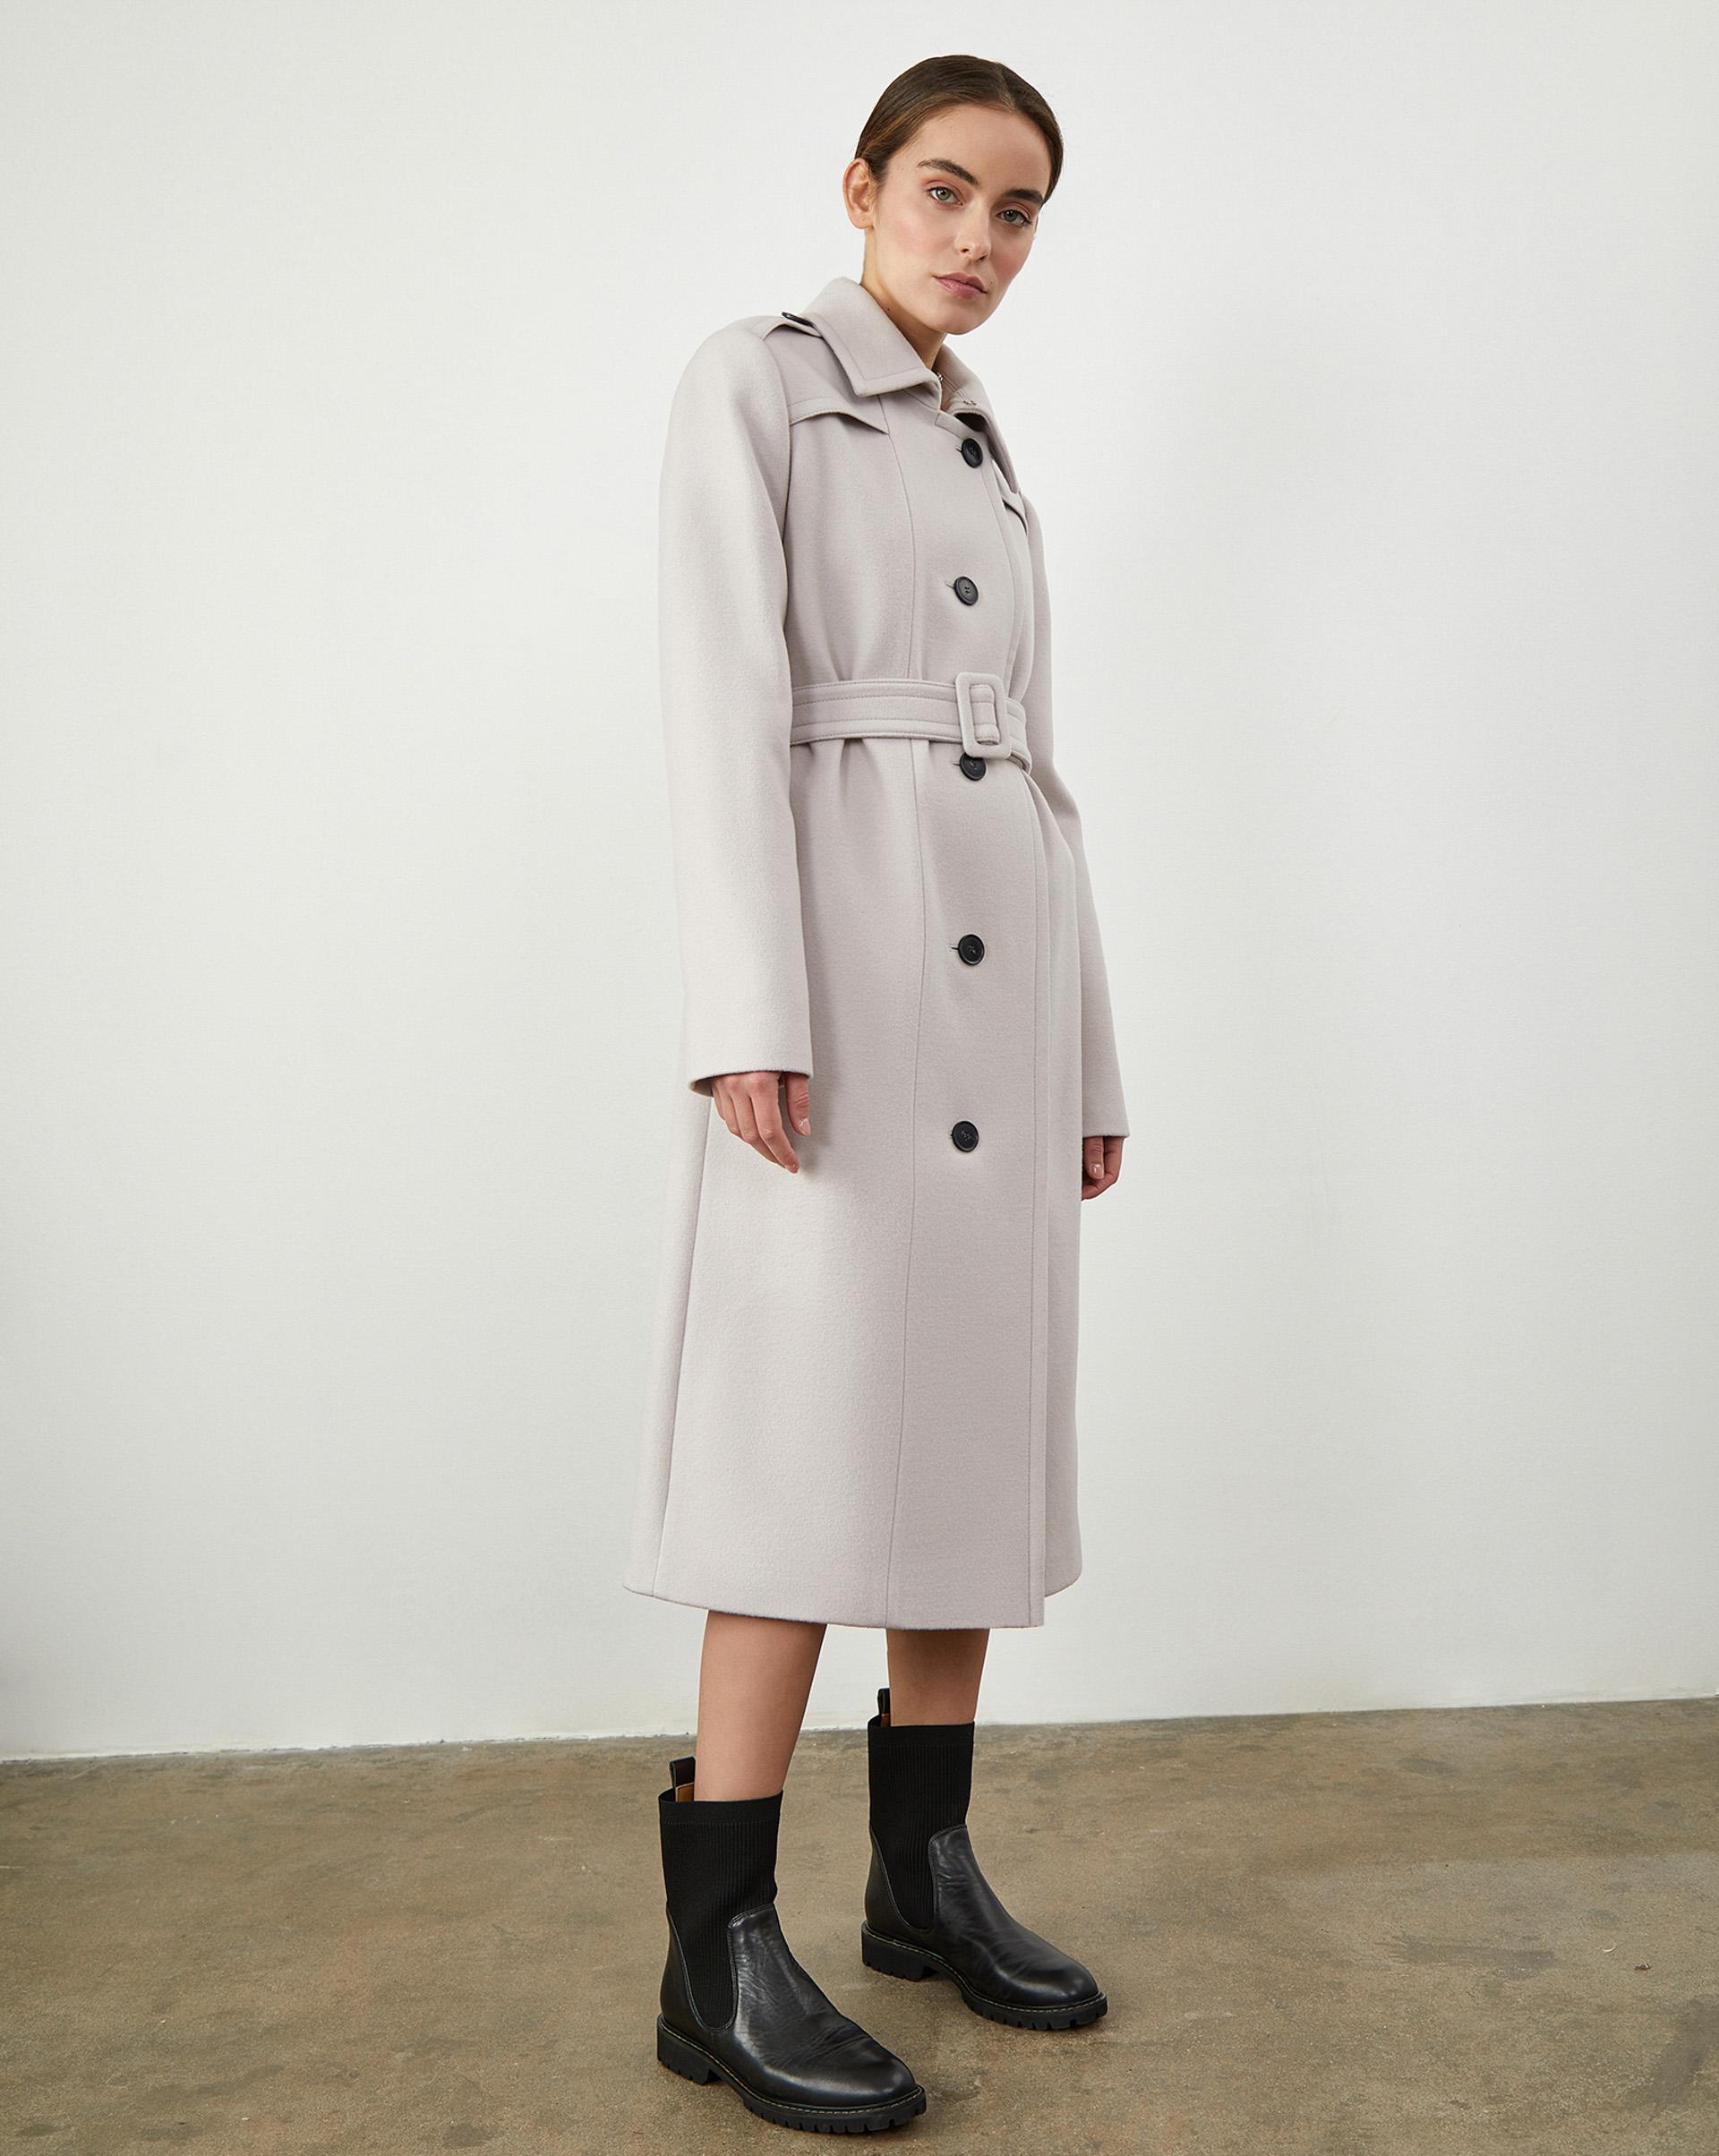 Пальто-тренч S фото